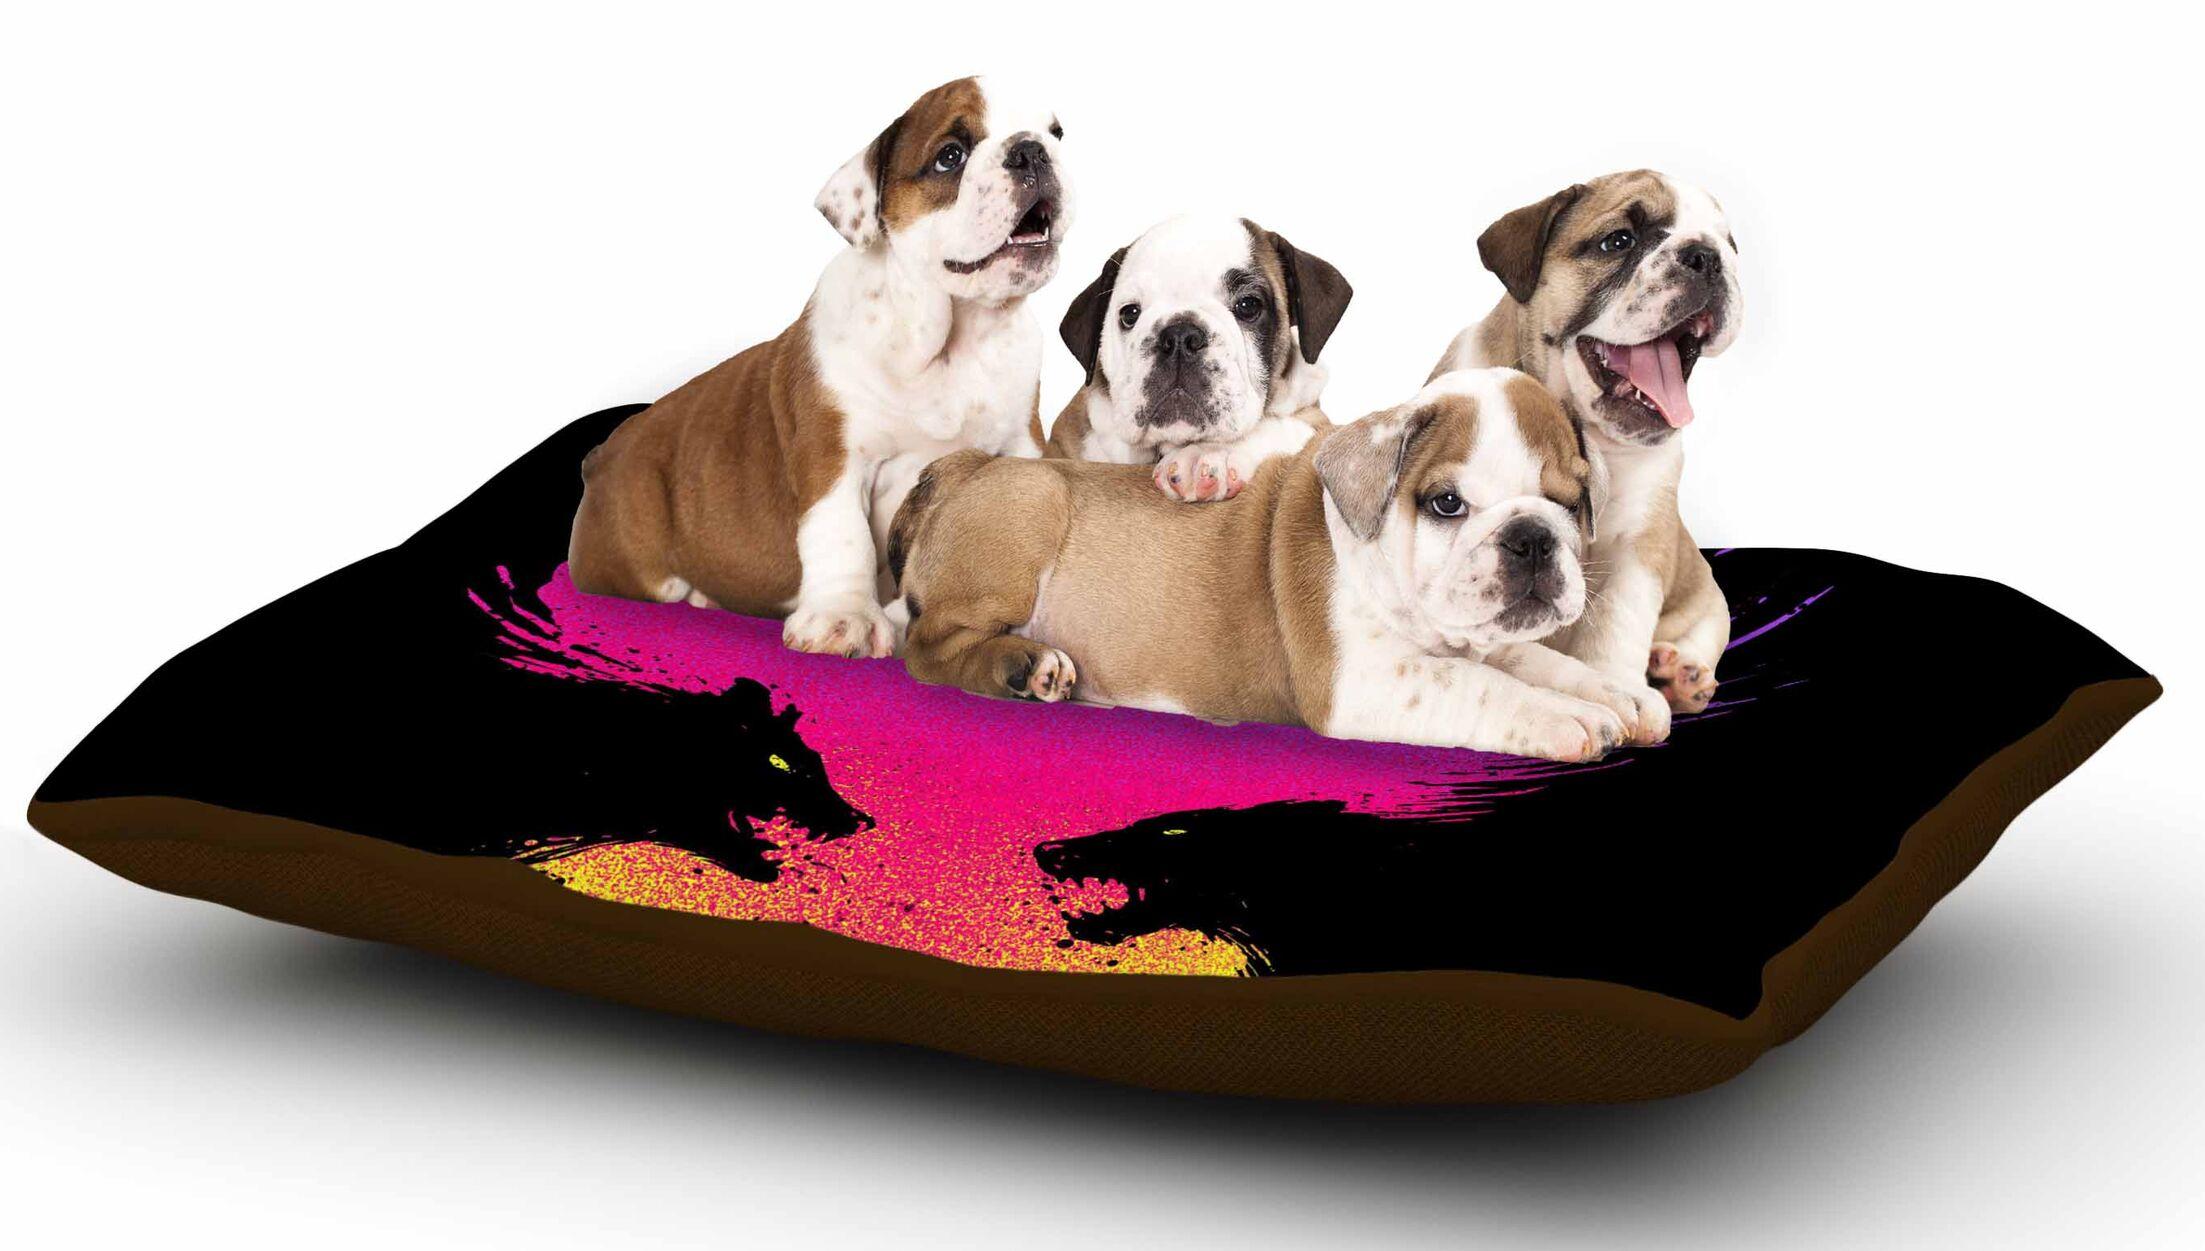 Barmalisirtb 'Wild Faces' Dog Pillow with Fleece Cozy Top